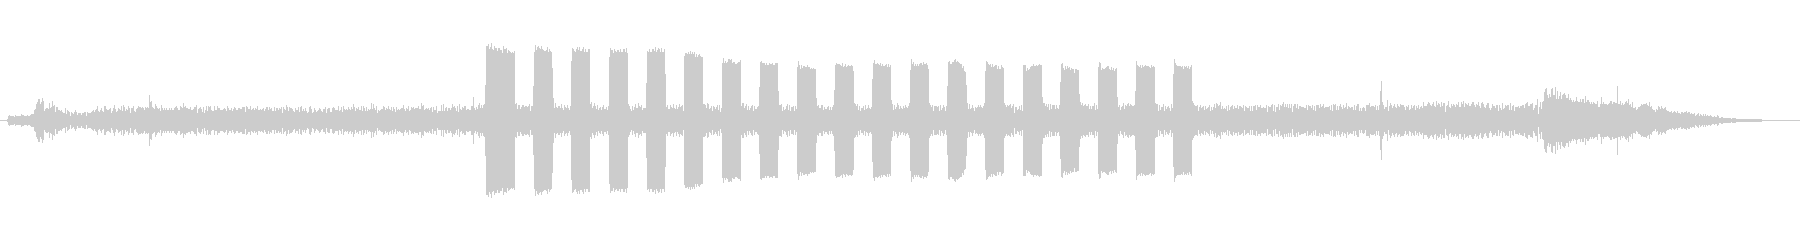 AMBULANCE:EXTERIO...の未再生の波形